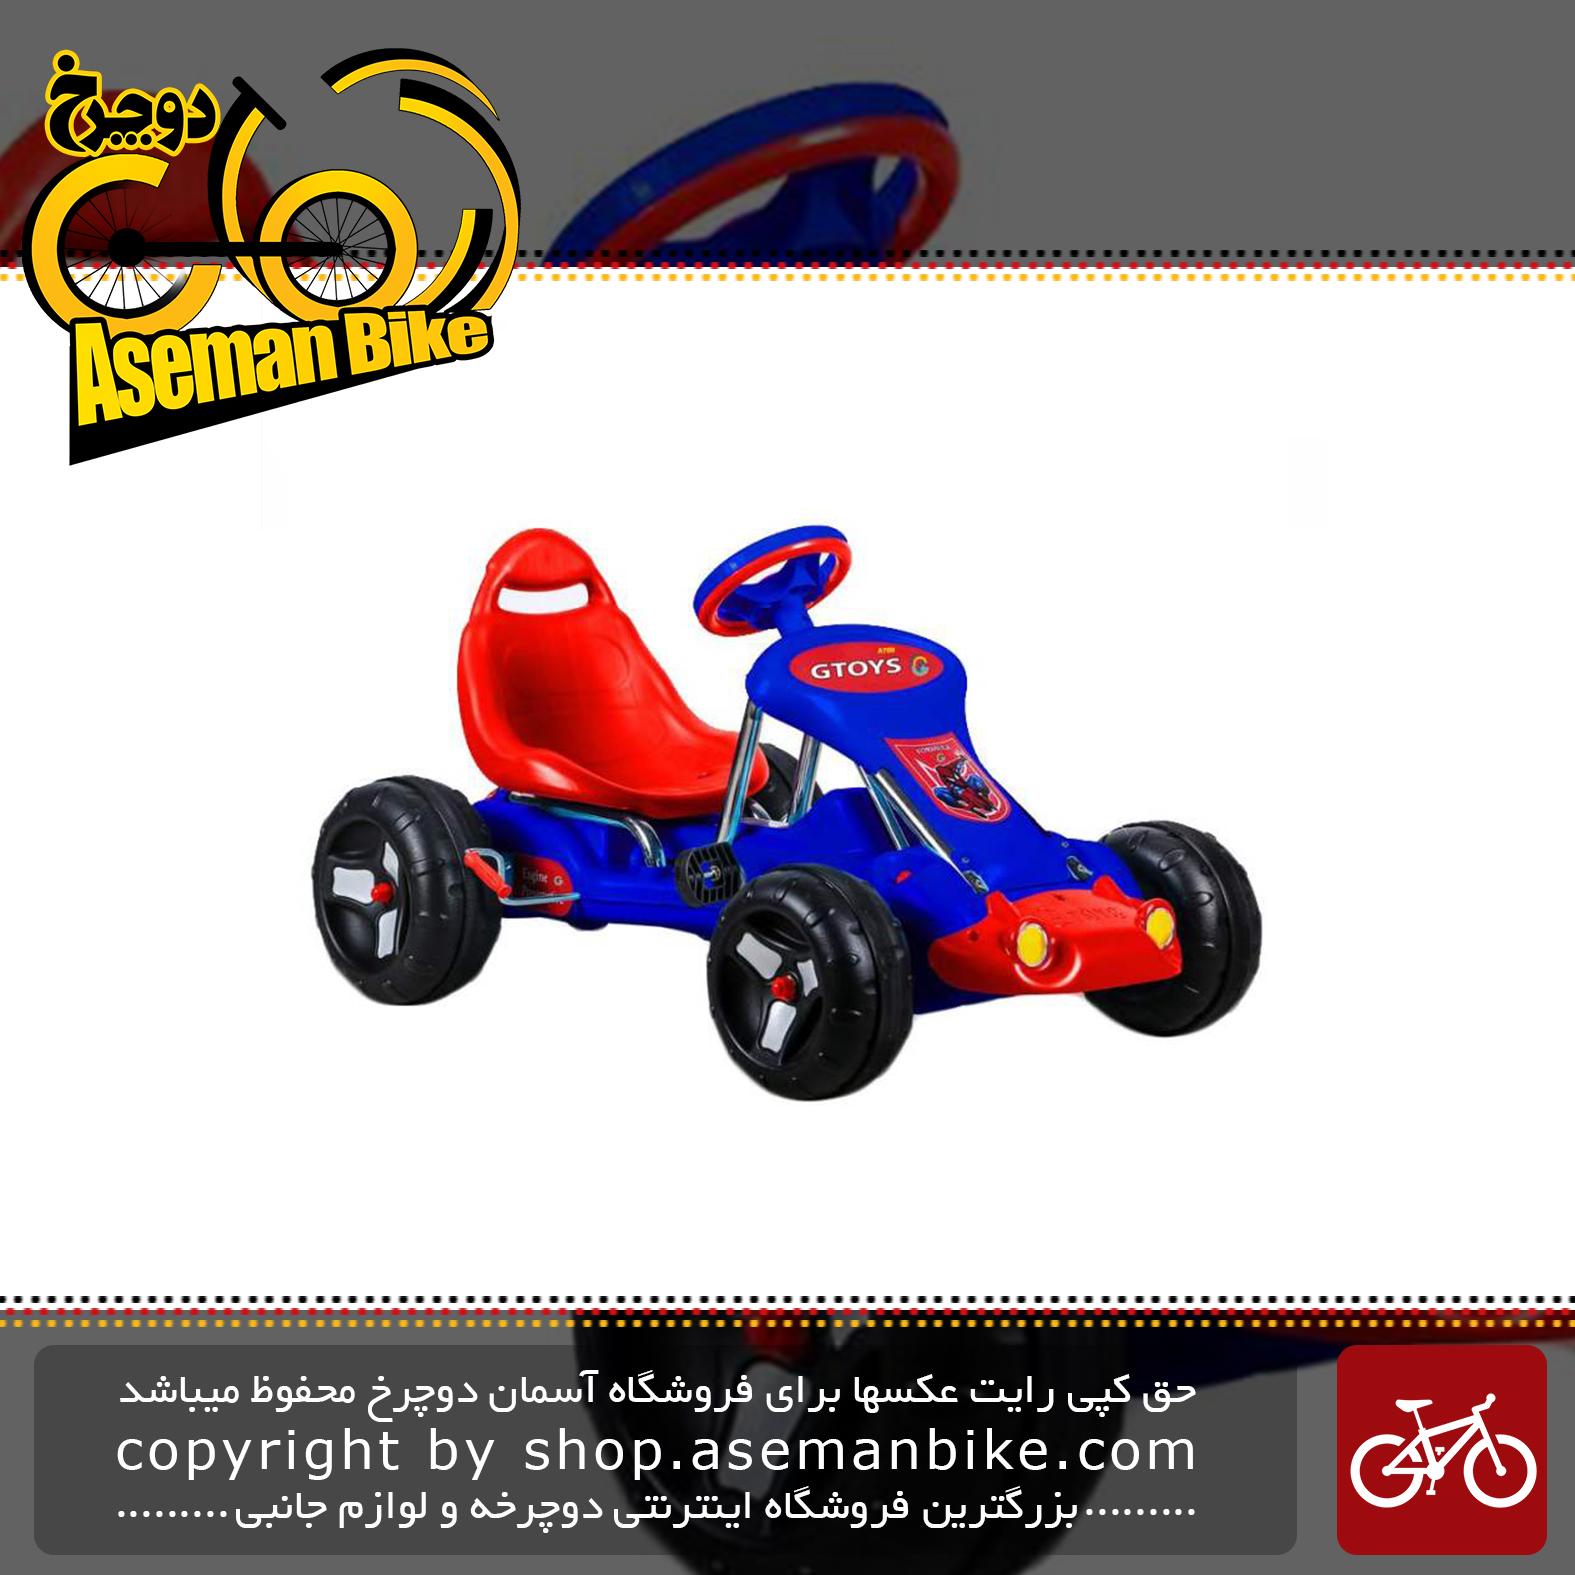 سه چرخه کودک جی تویز مدل Kids Car Gtoys A700